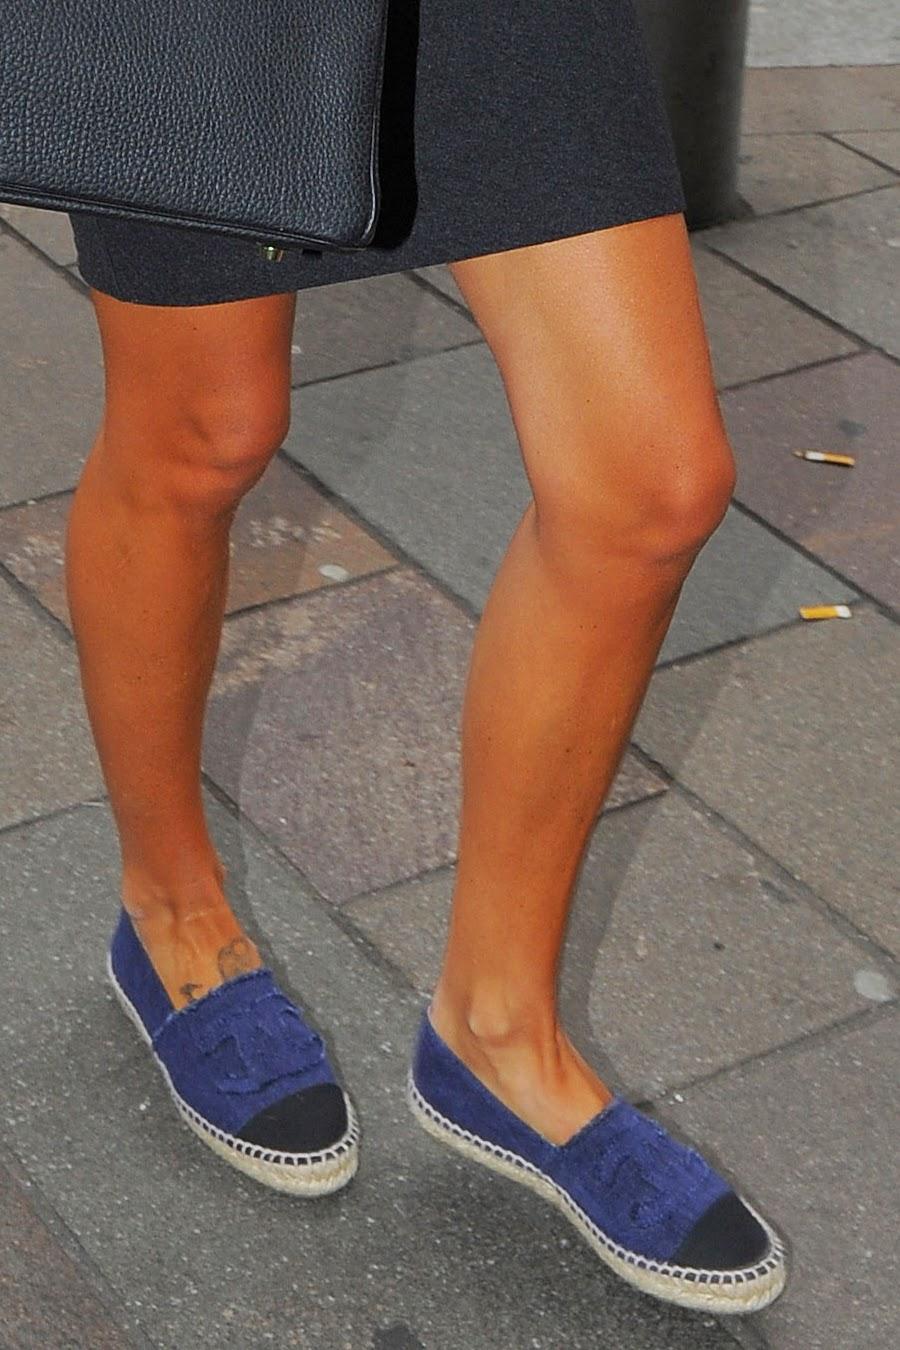 Ecclestone shopping at Harrods in London, England - September 1, 2014